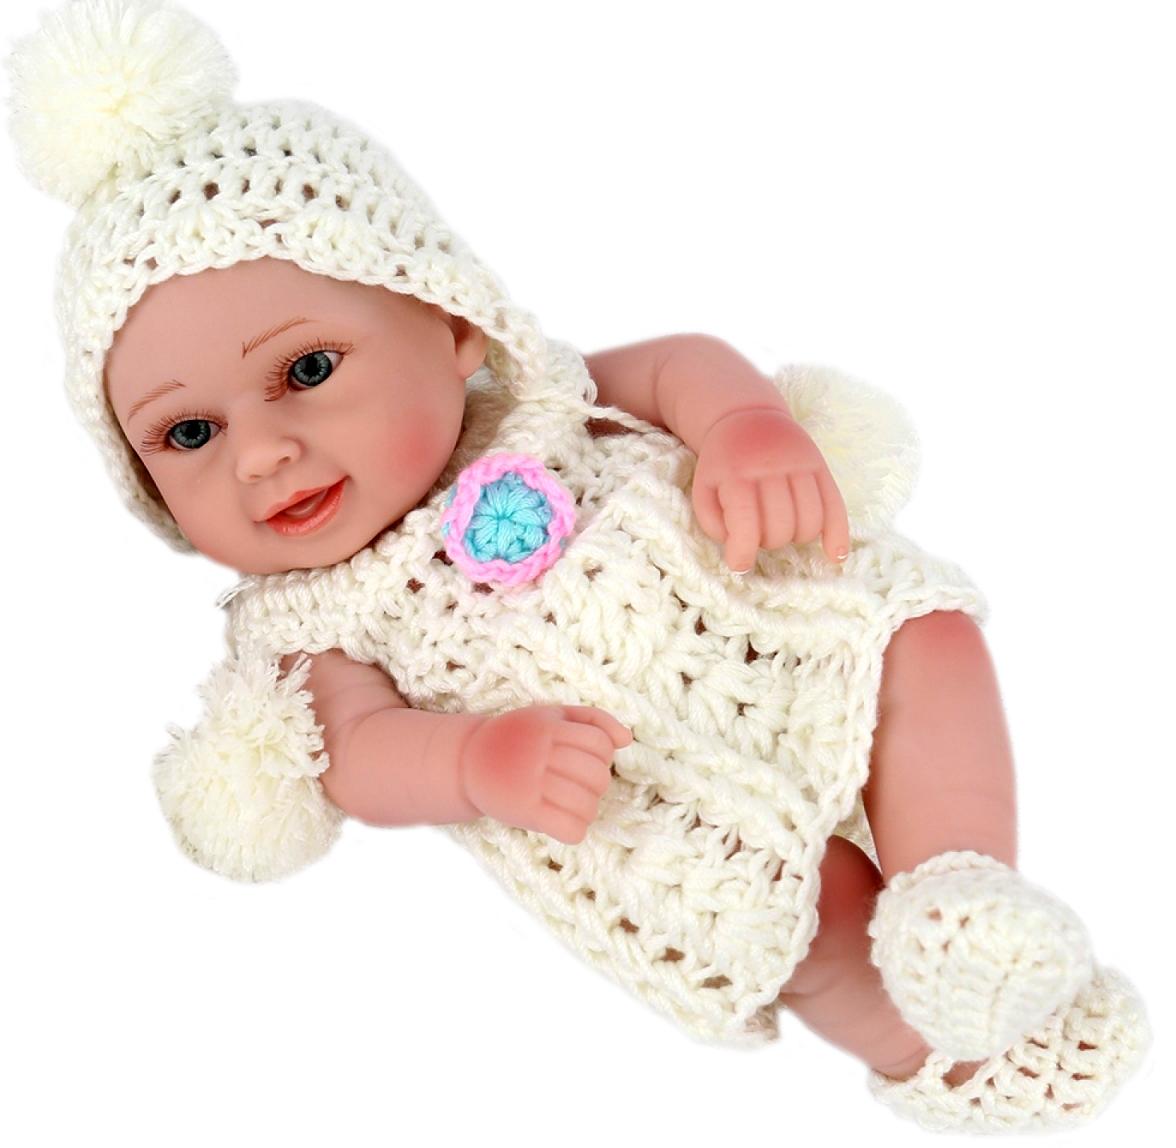 Кукла Reborn Kids мини-реборн Адель